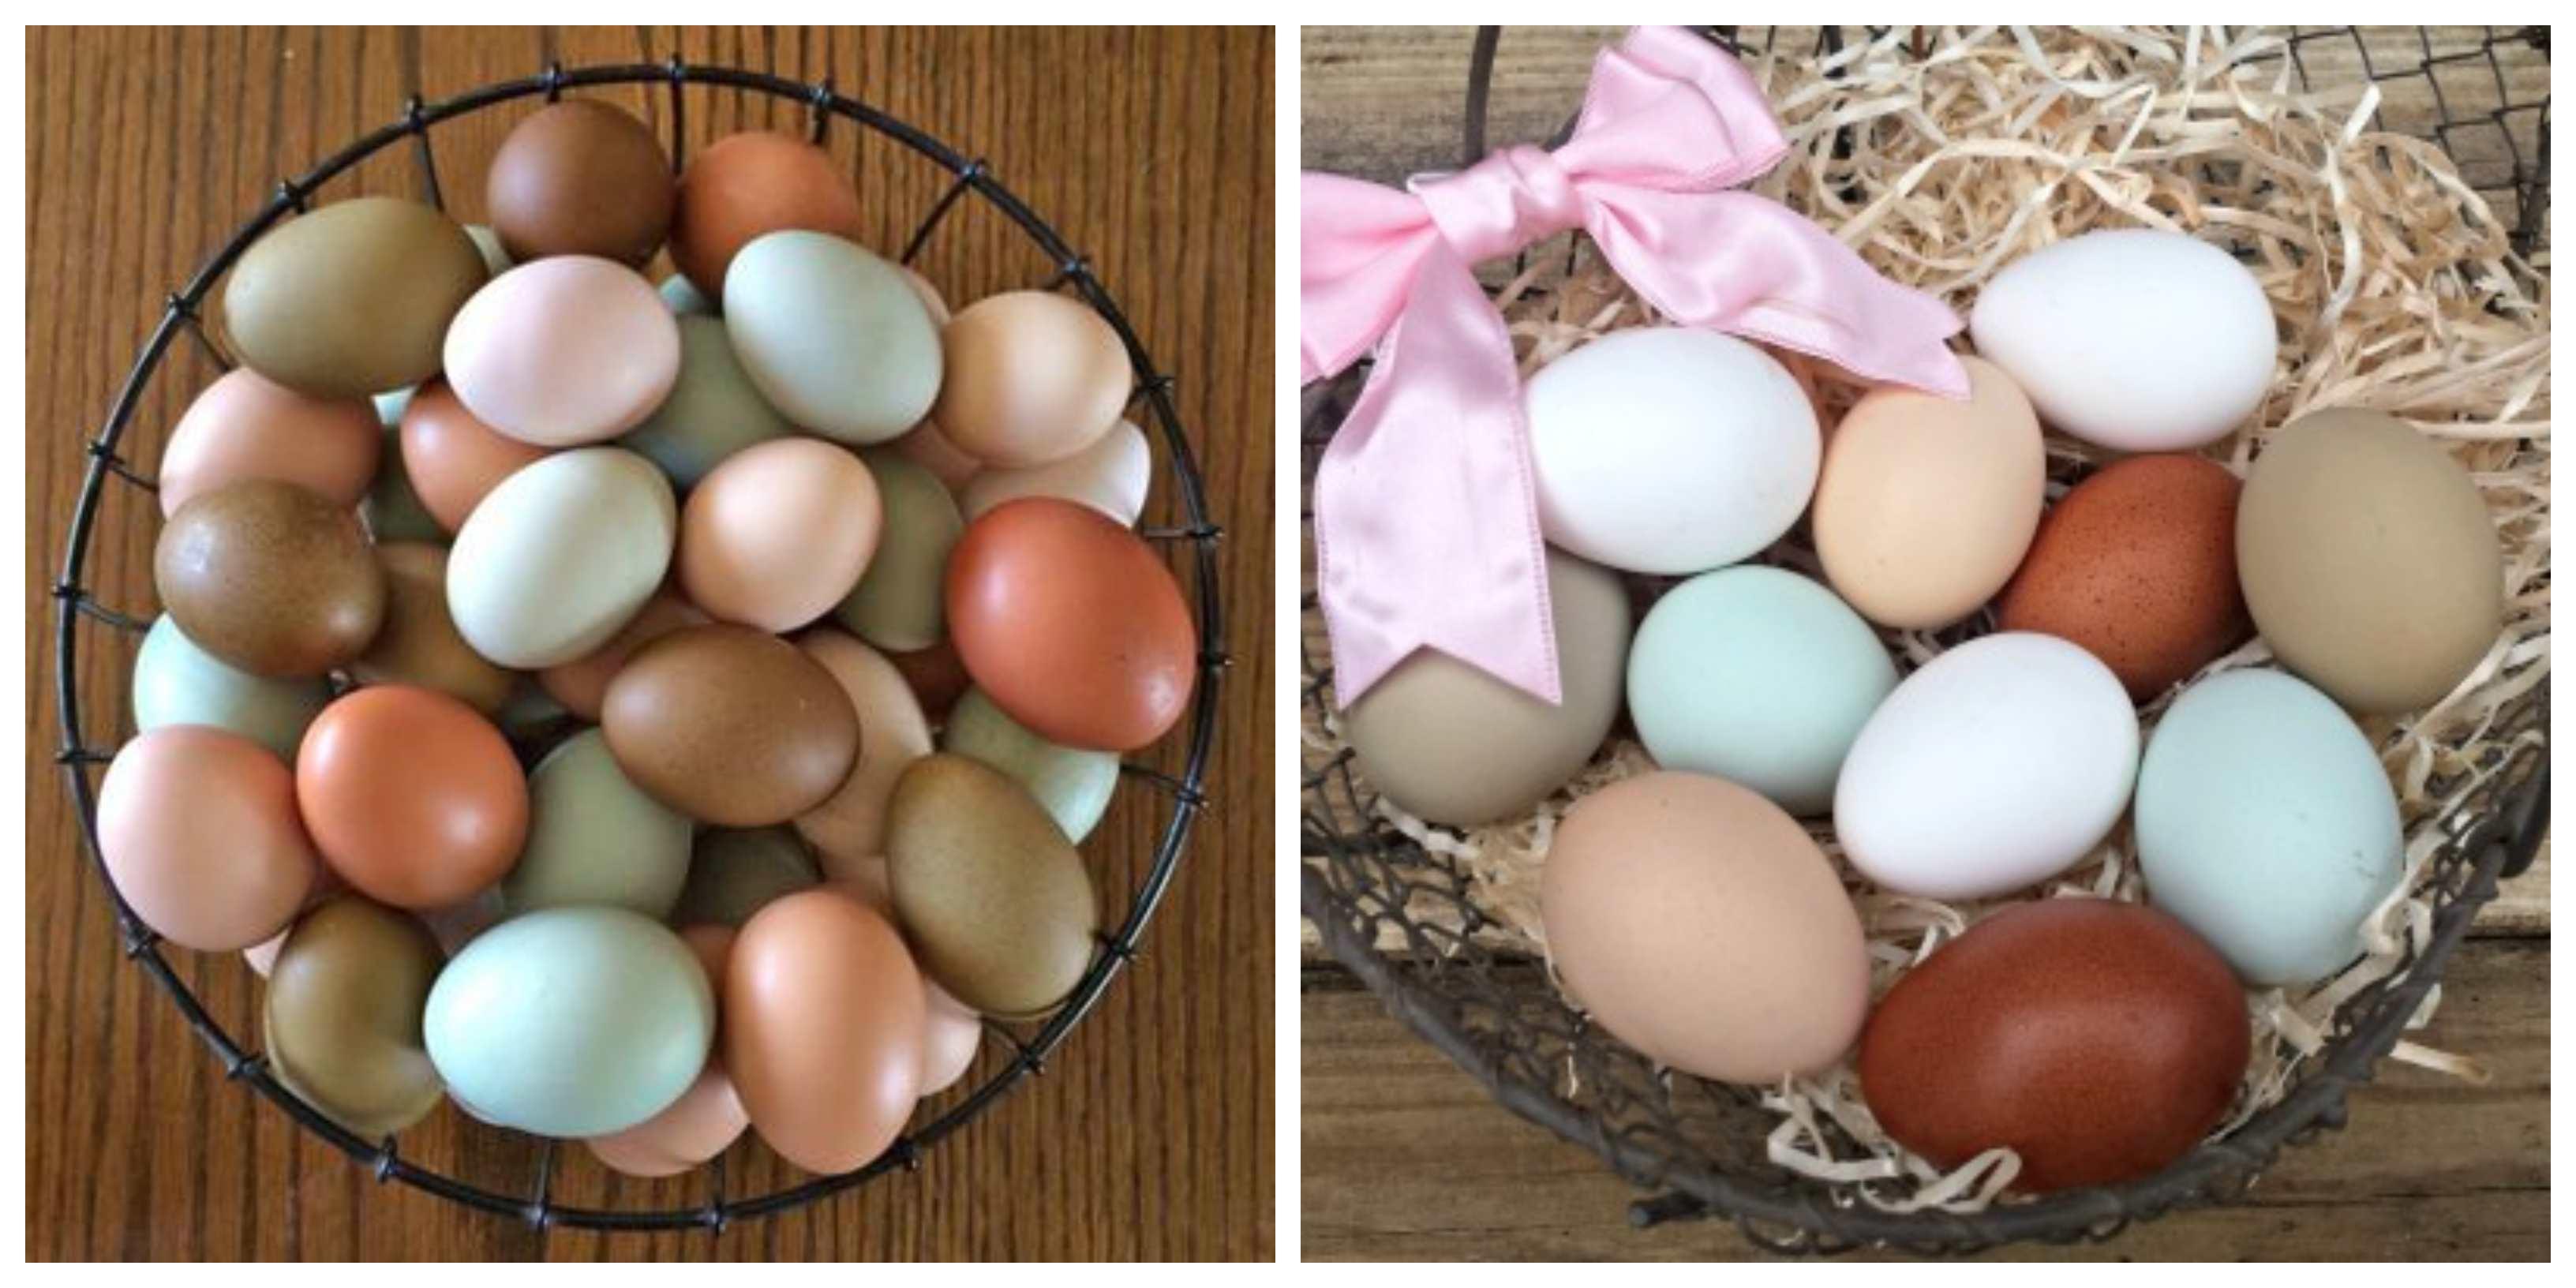 diiferent color chicken eggs